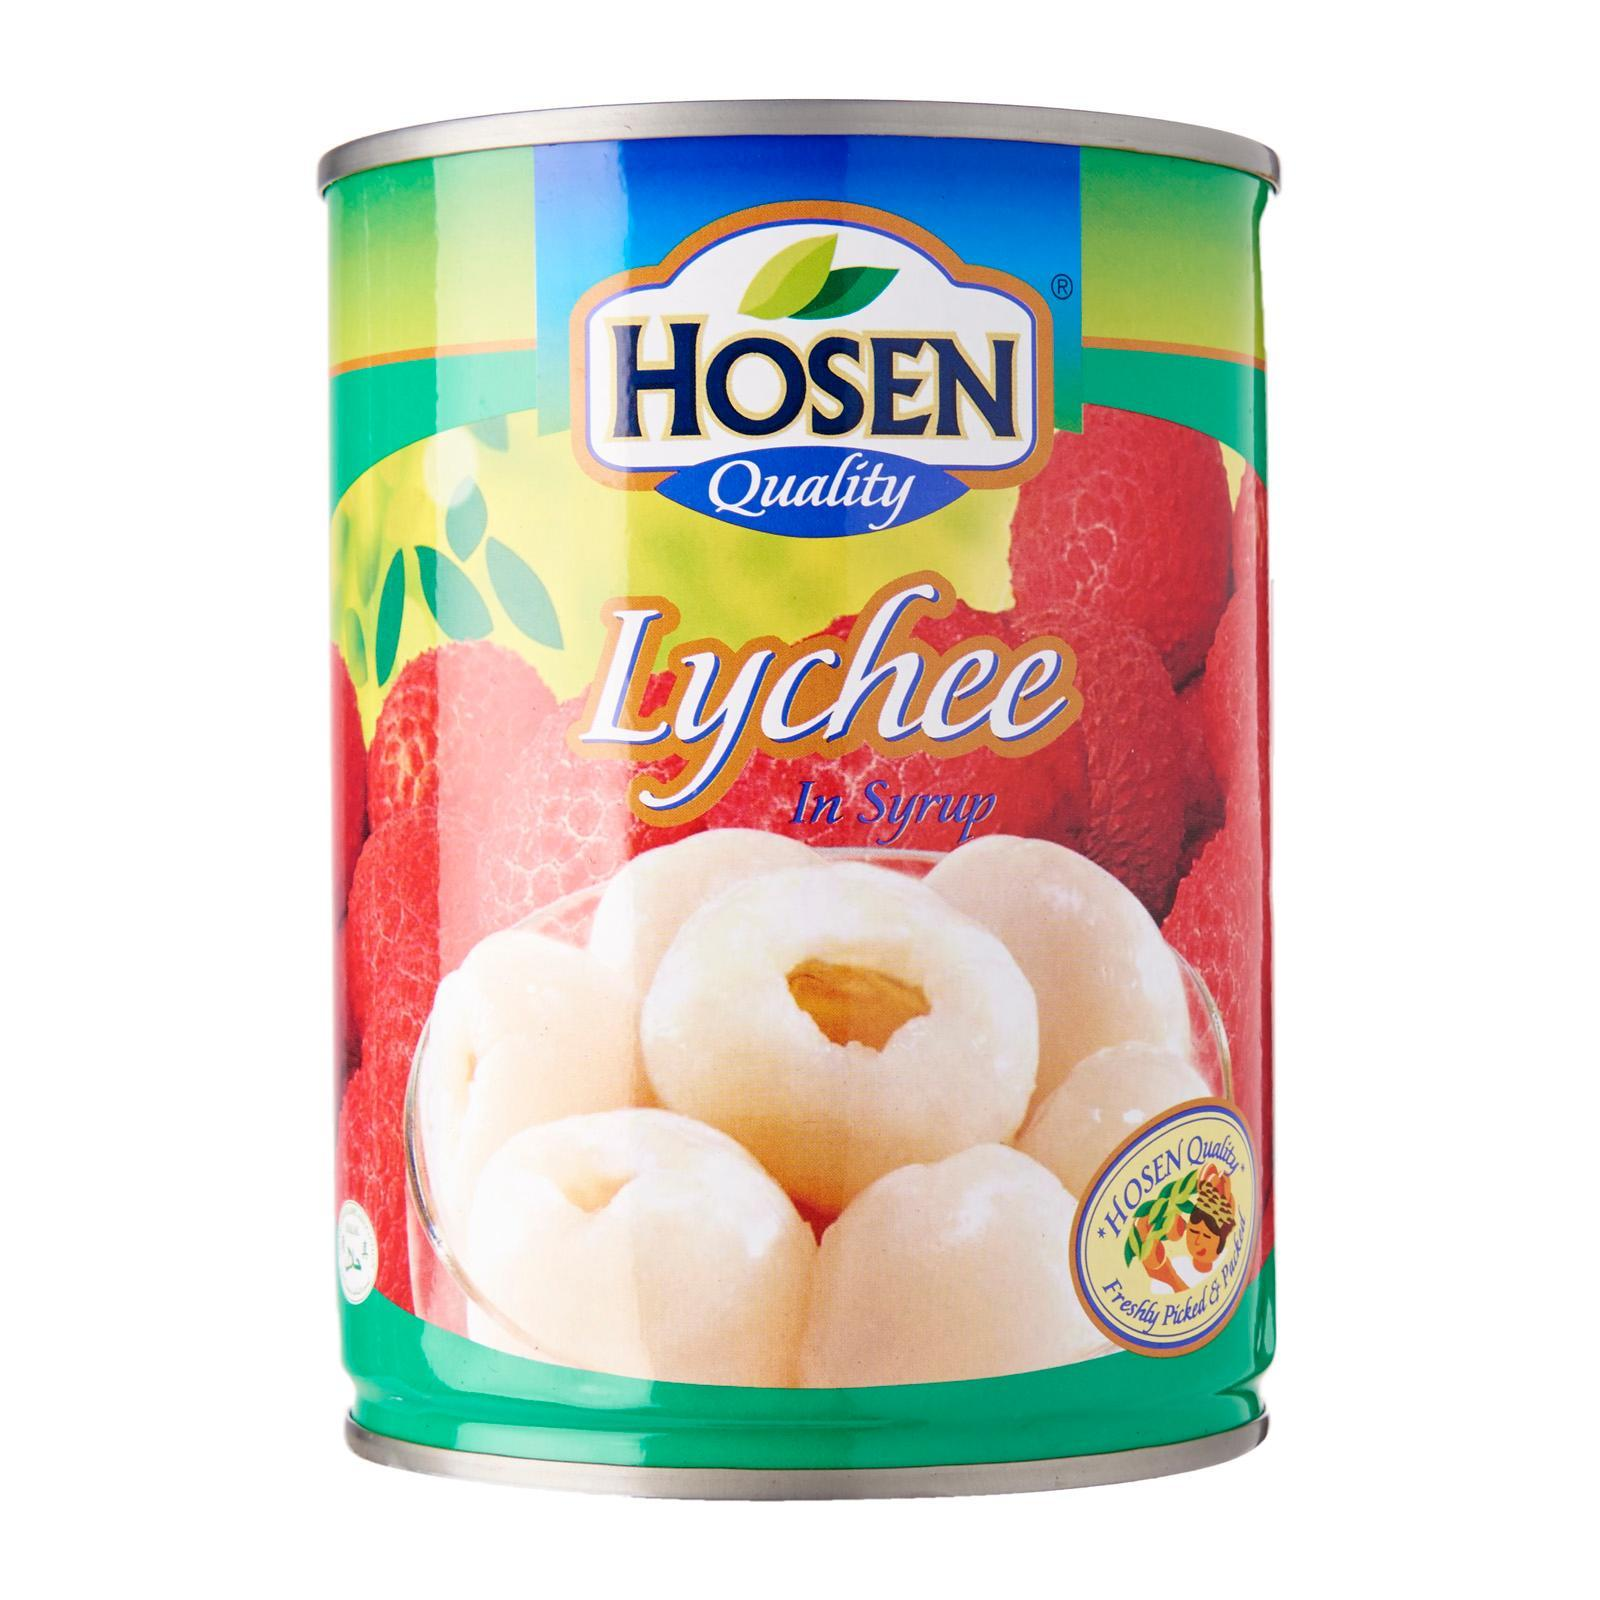 HOSEN Lychee In Syrup 565g